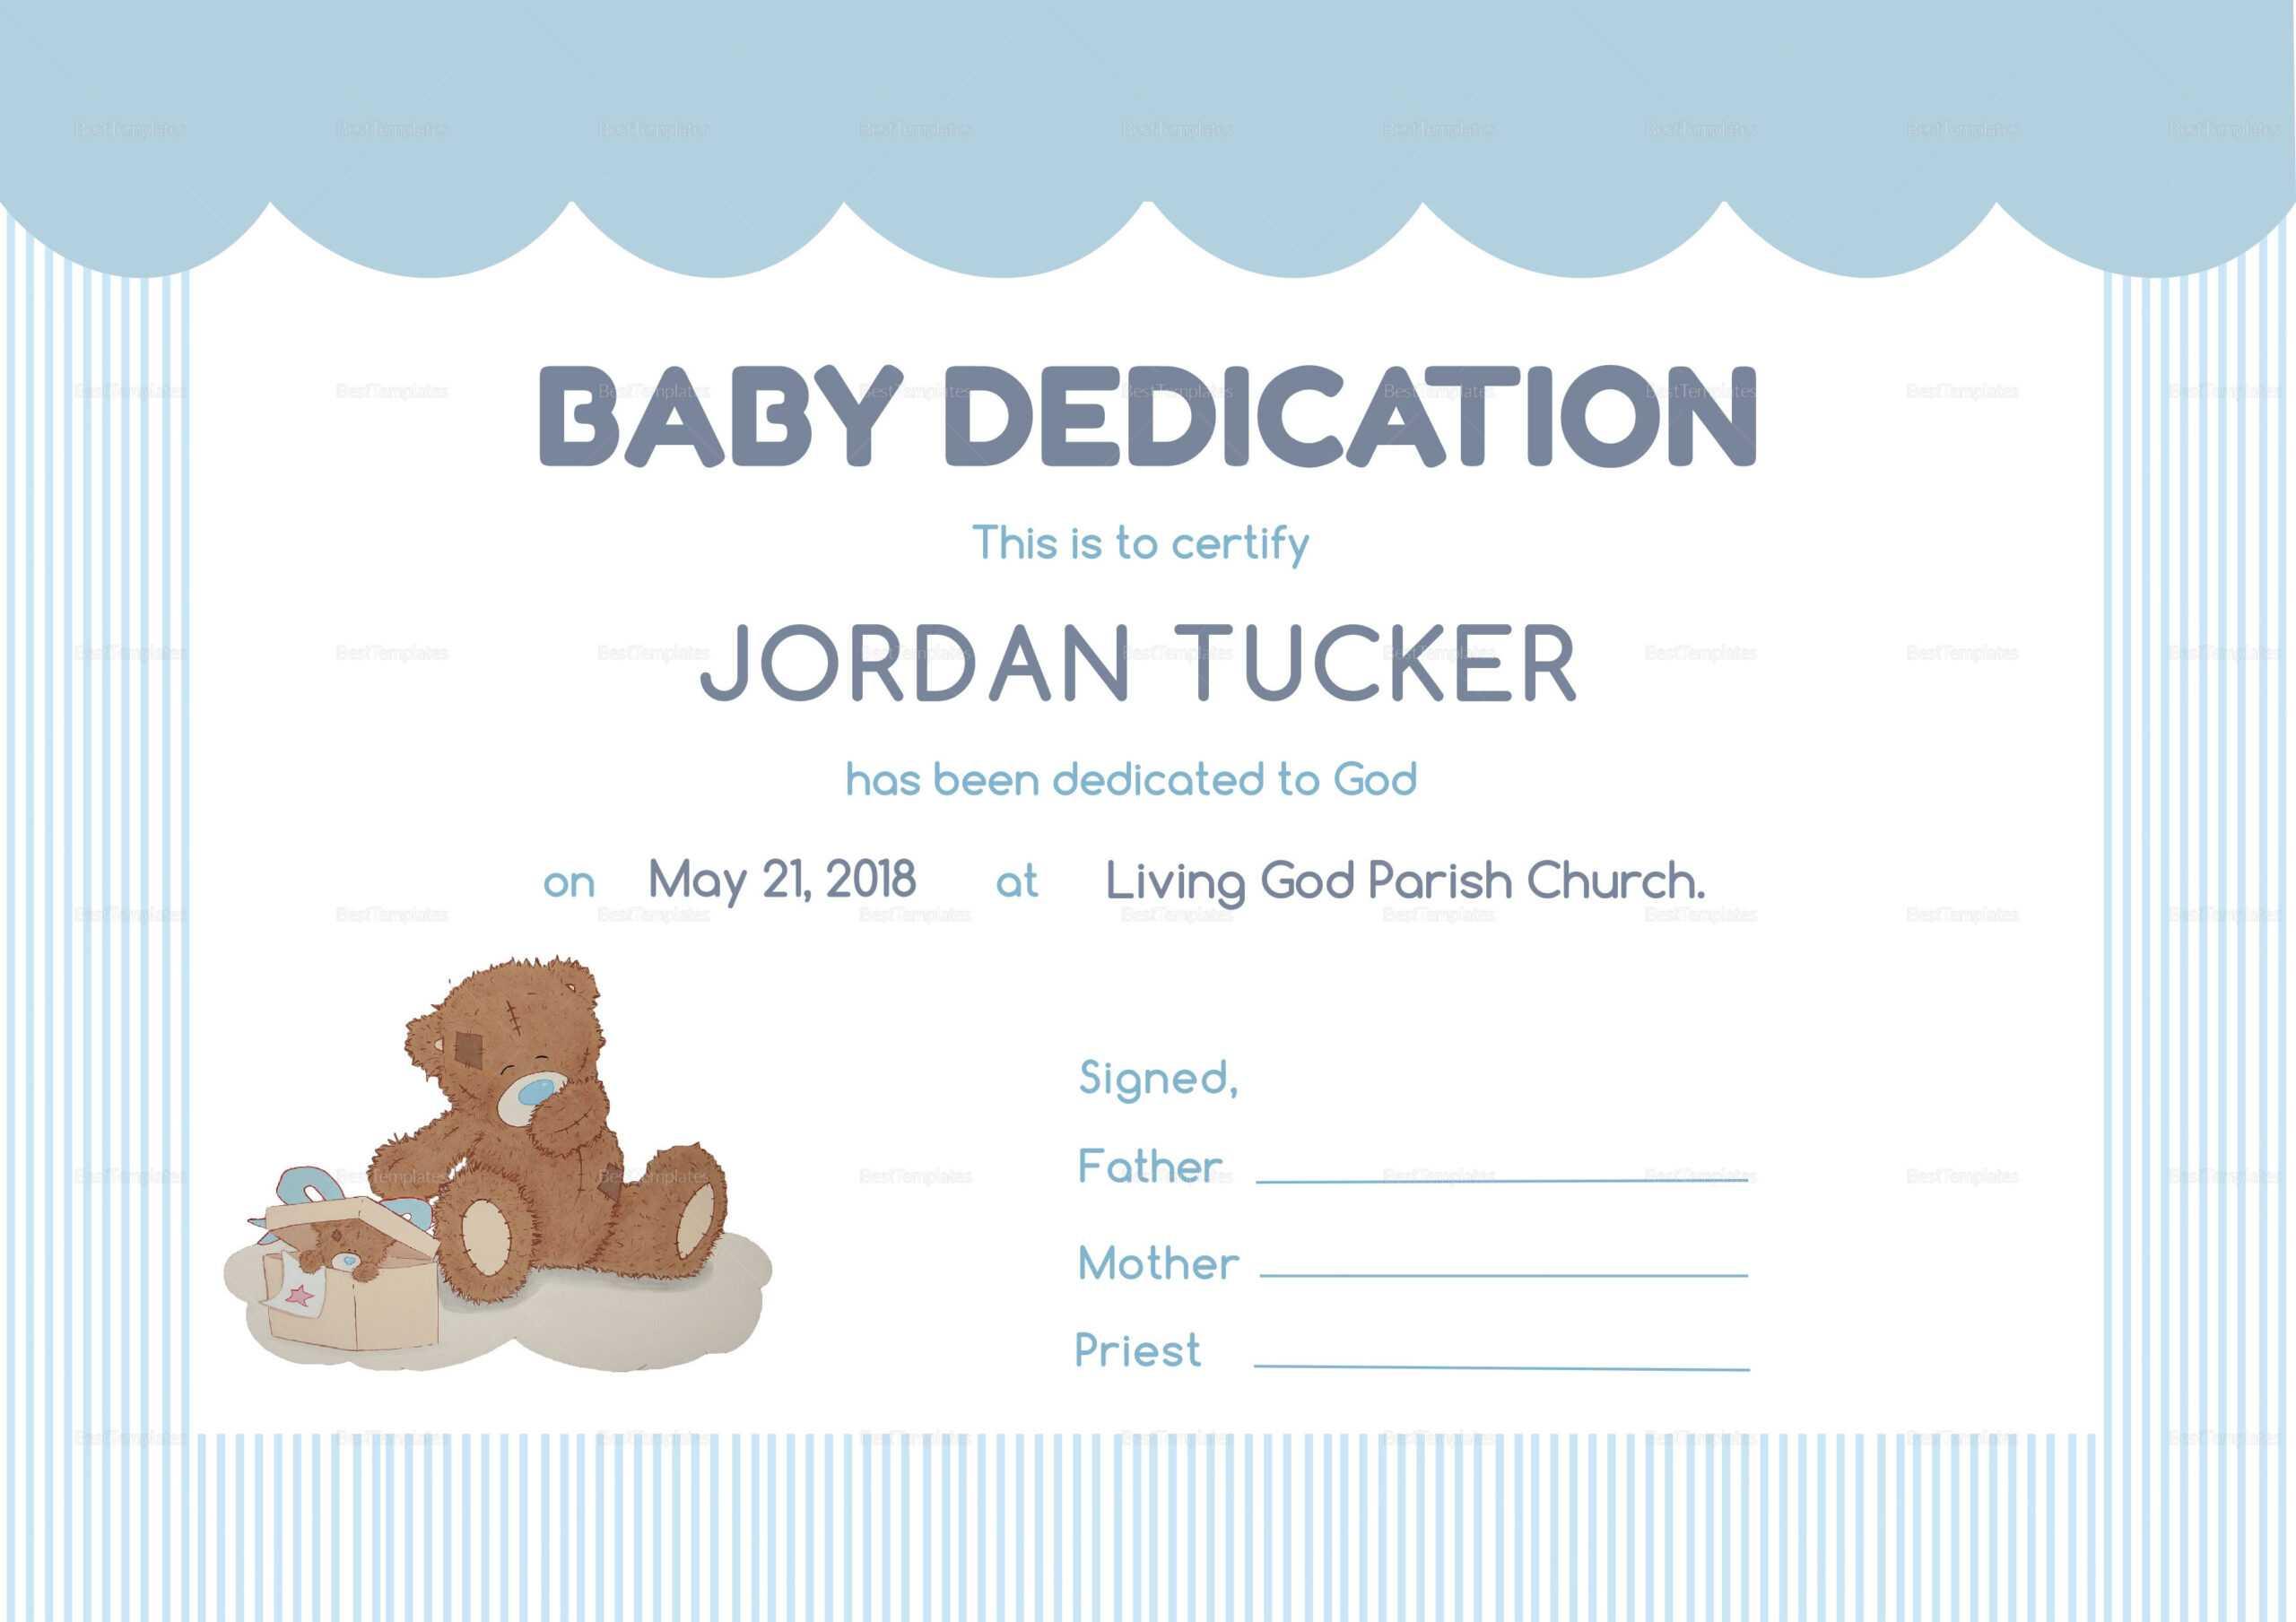 Dedication Certificates - Karan.ald2014 Regarding Baby Dedication Certificate Template